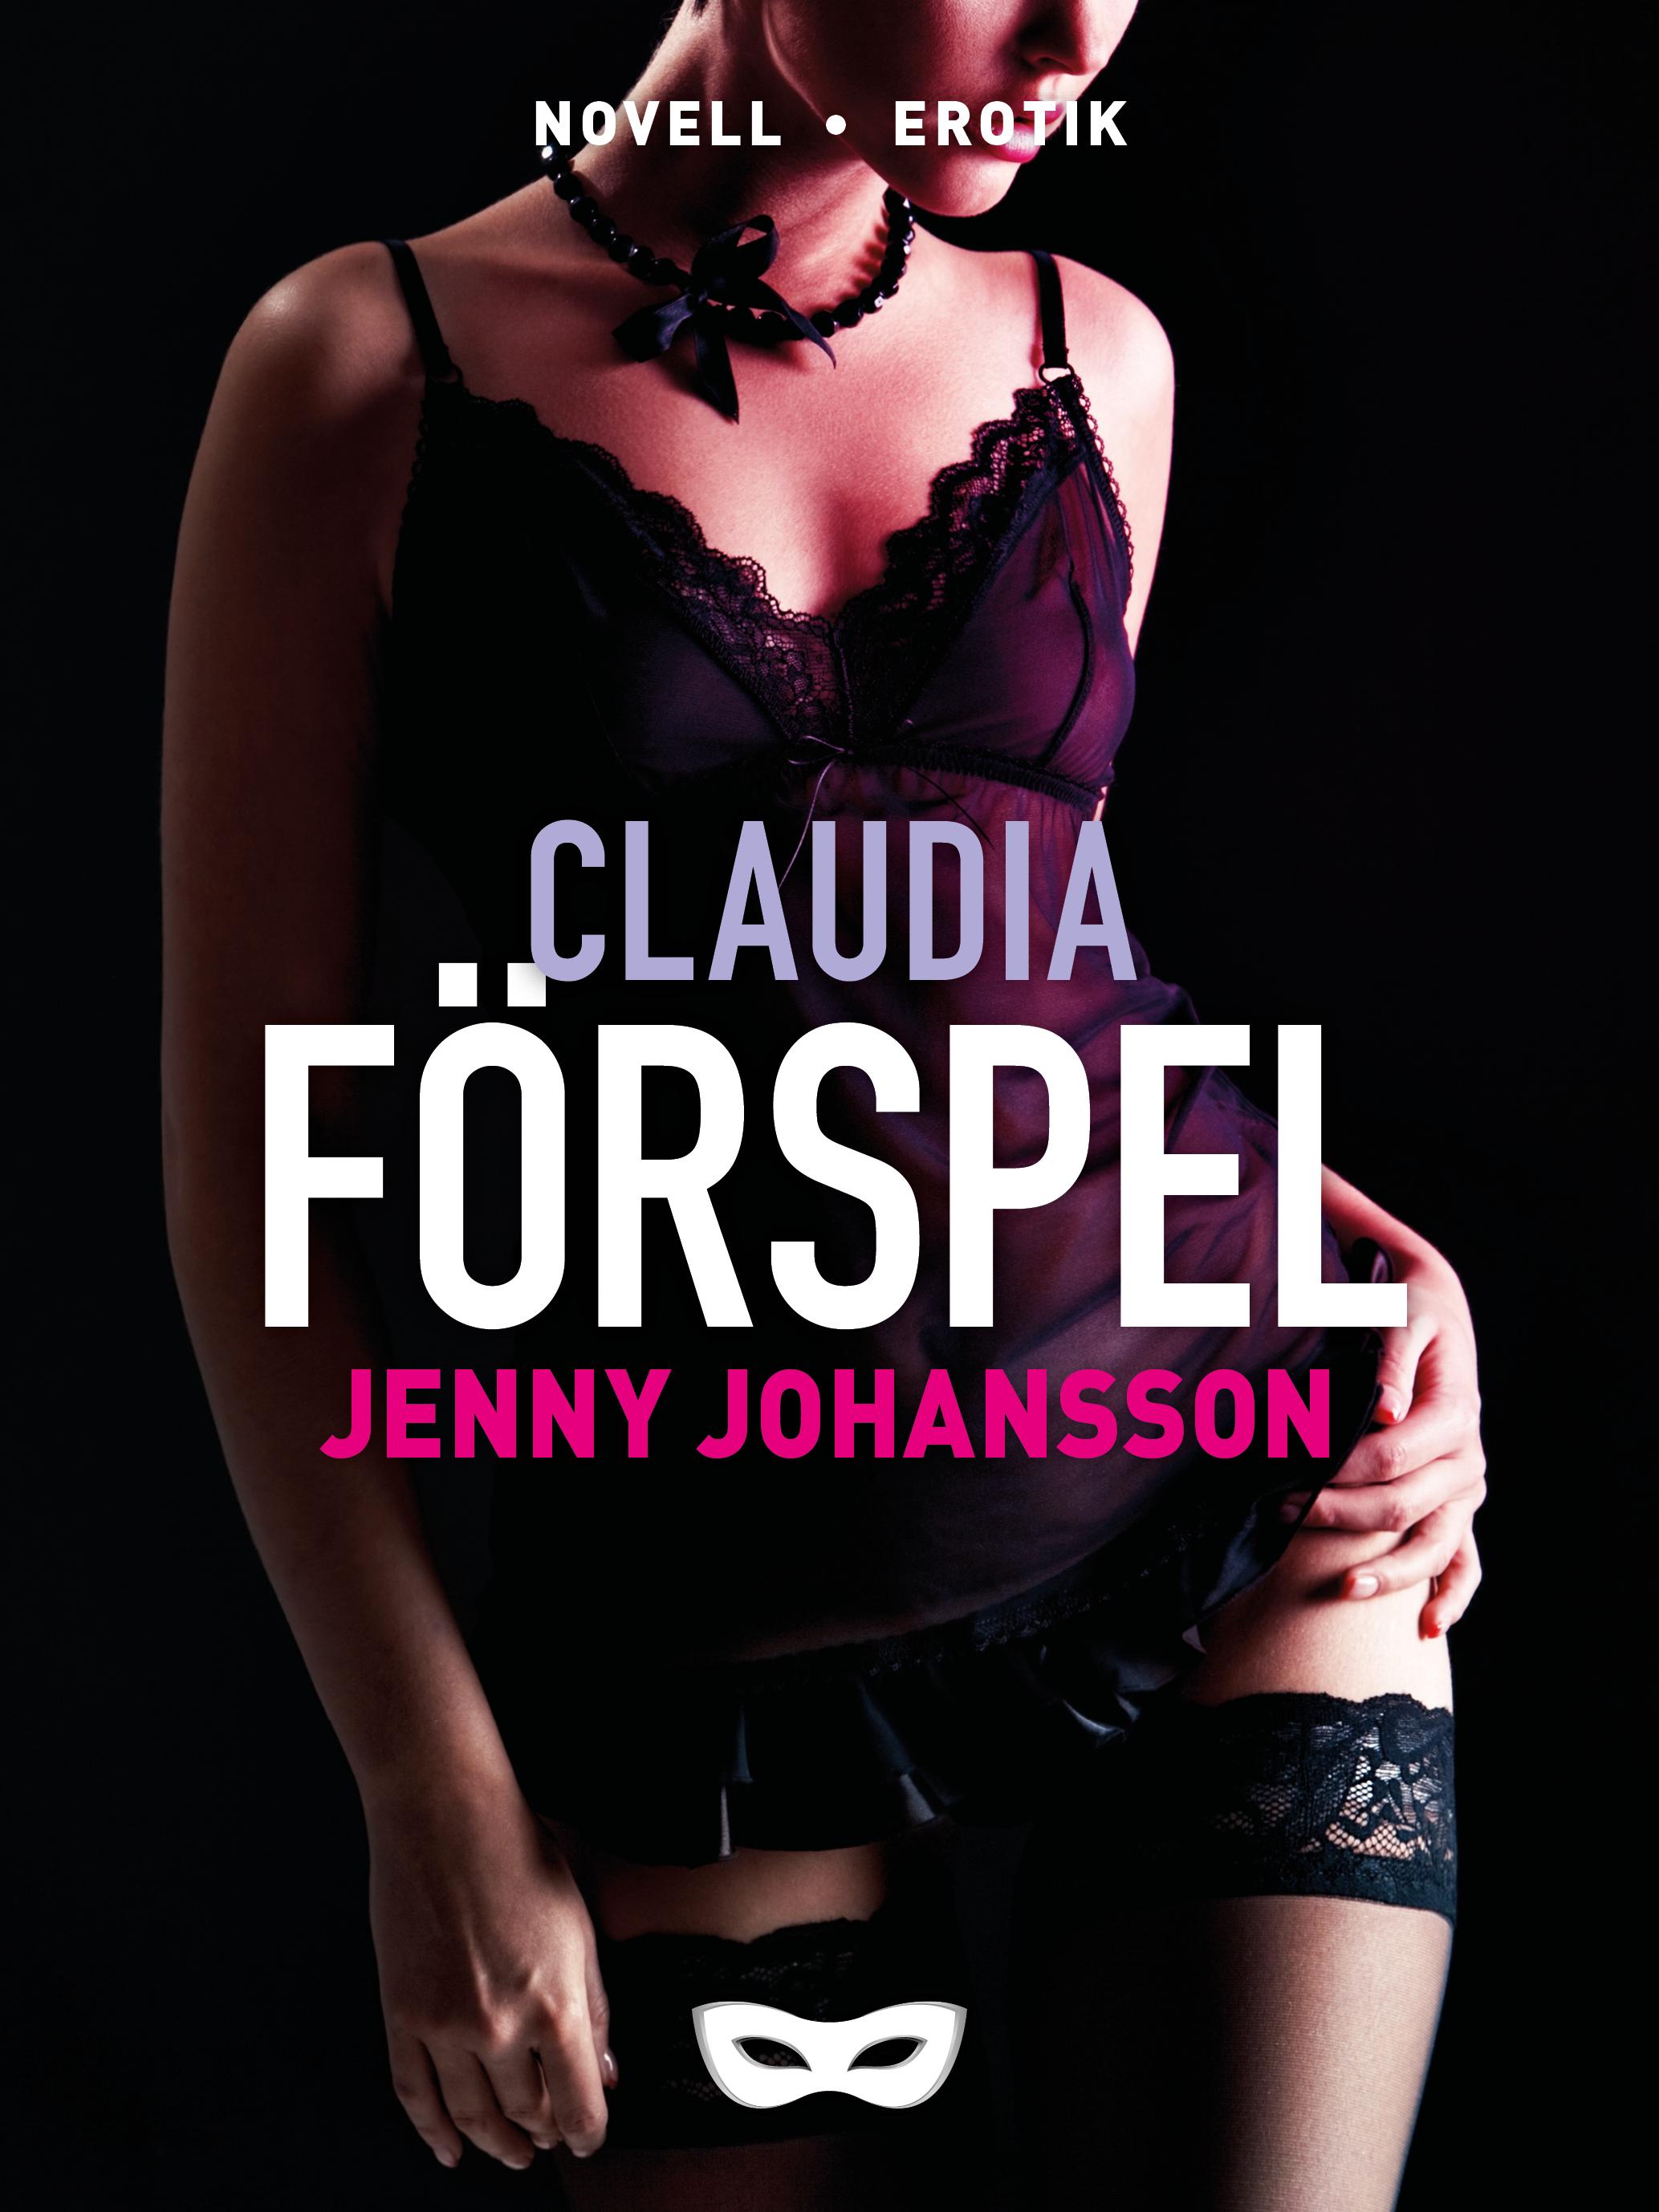 CLAU1_Forspel_Jenny Johansson.jpg